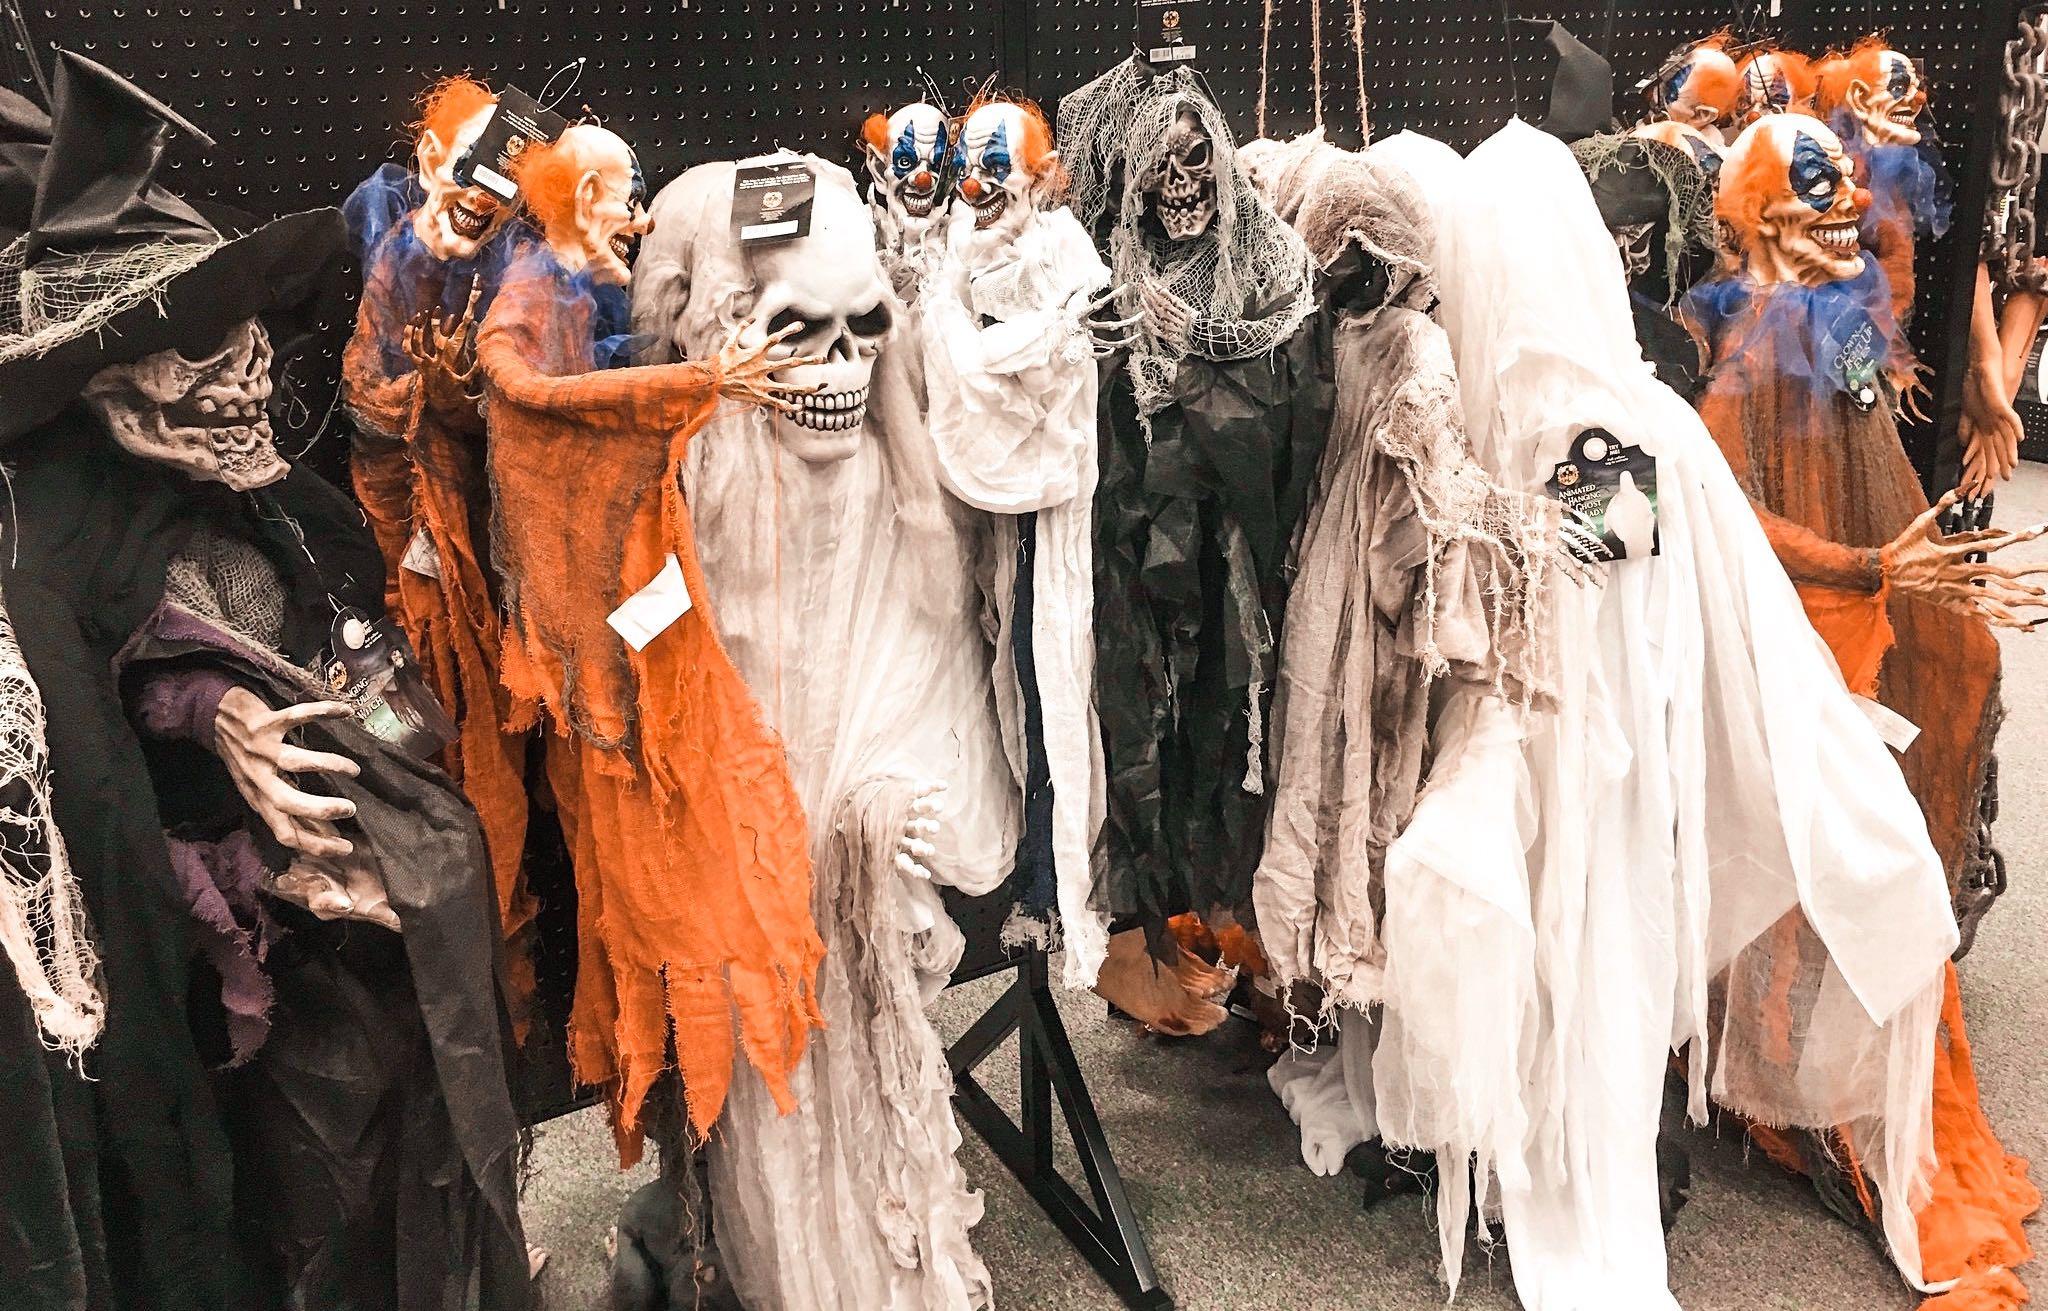 Asu Halloween Party 2020 Getting into the 'Spirit' of Halloween | ASU Now: Access